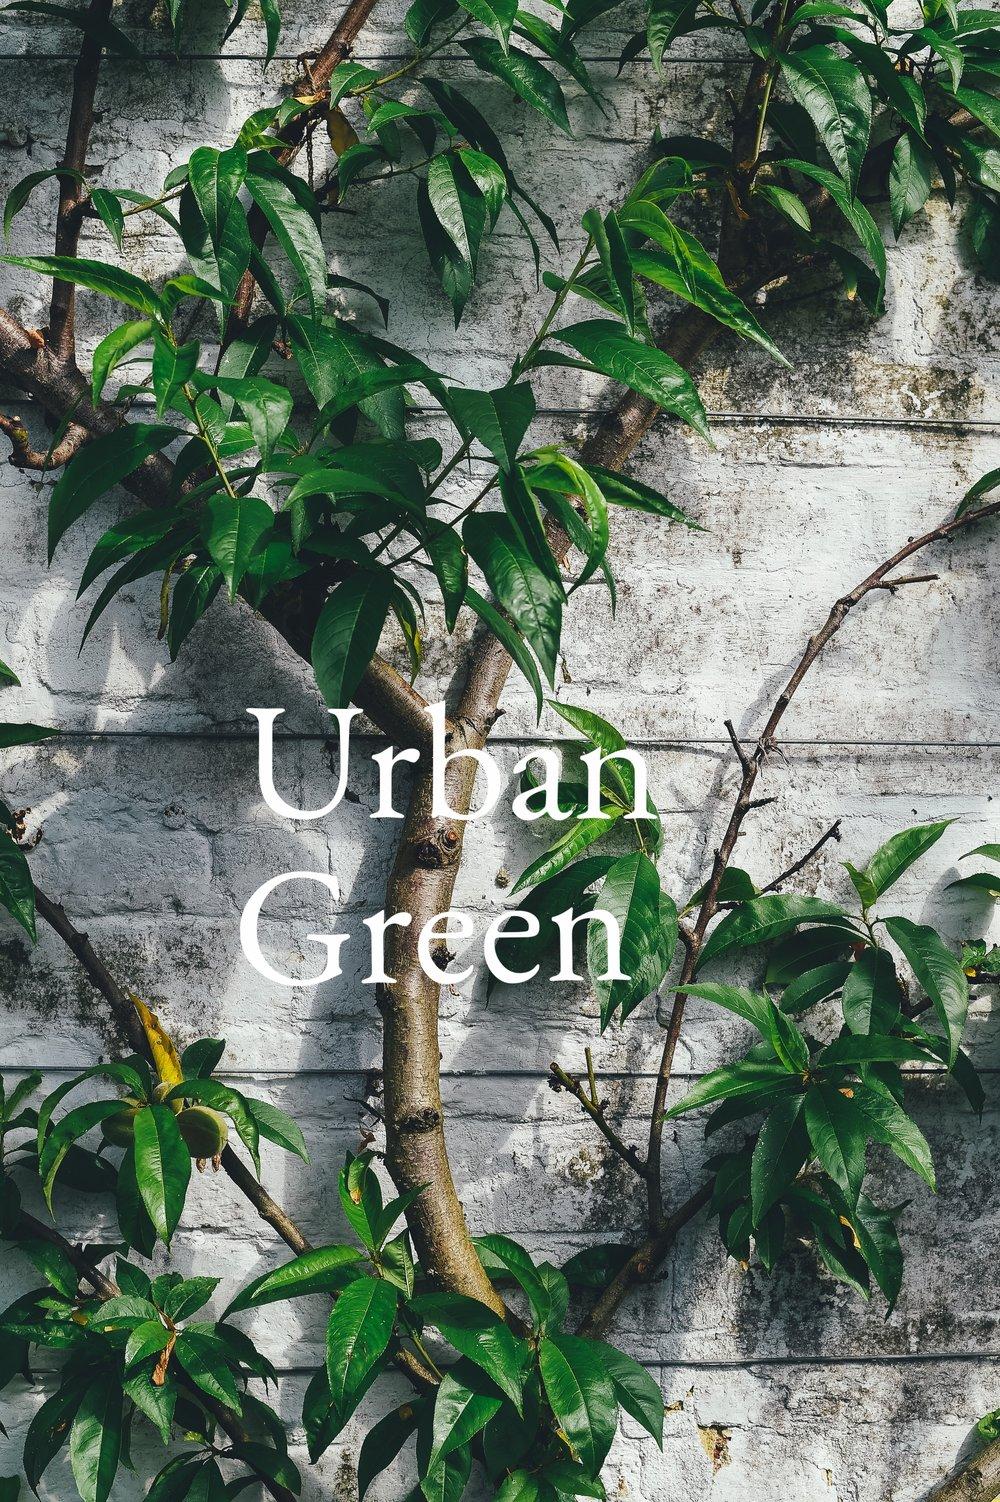 espalier for the urban green annie spratt Up cL.jpeg